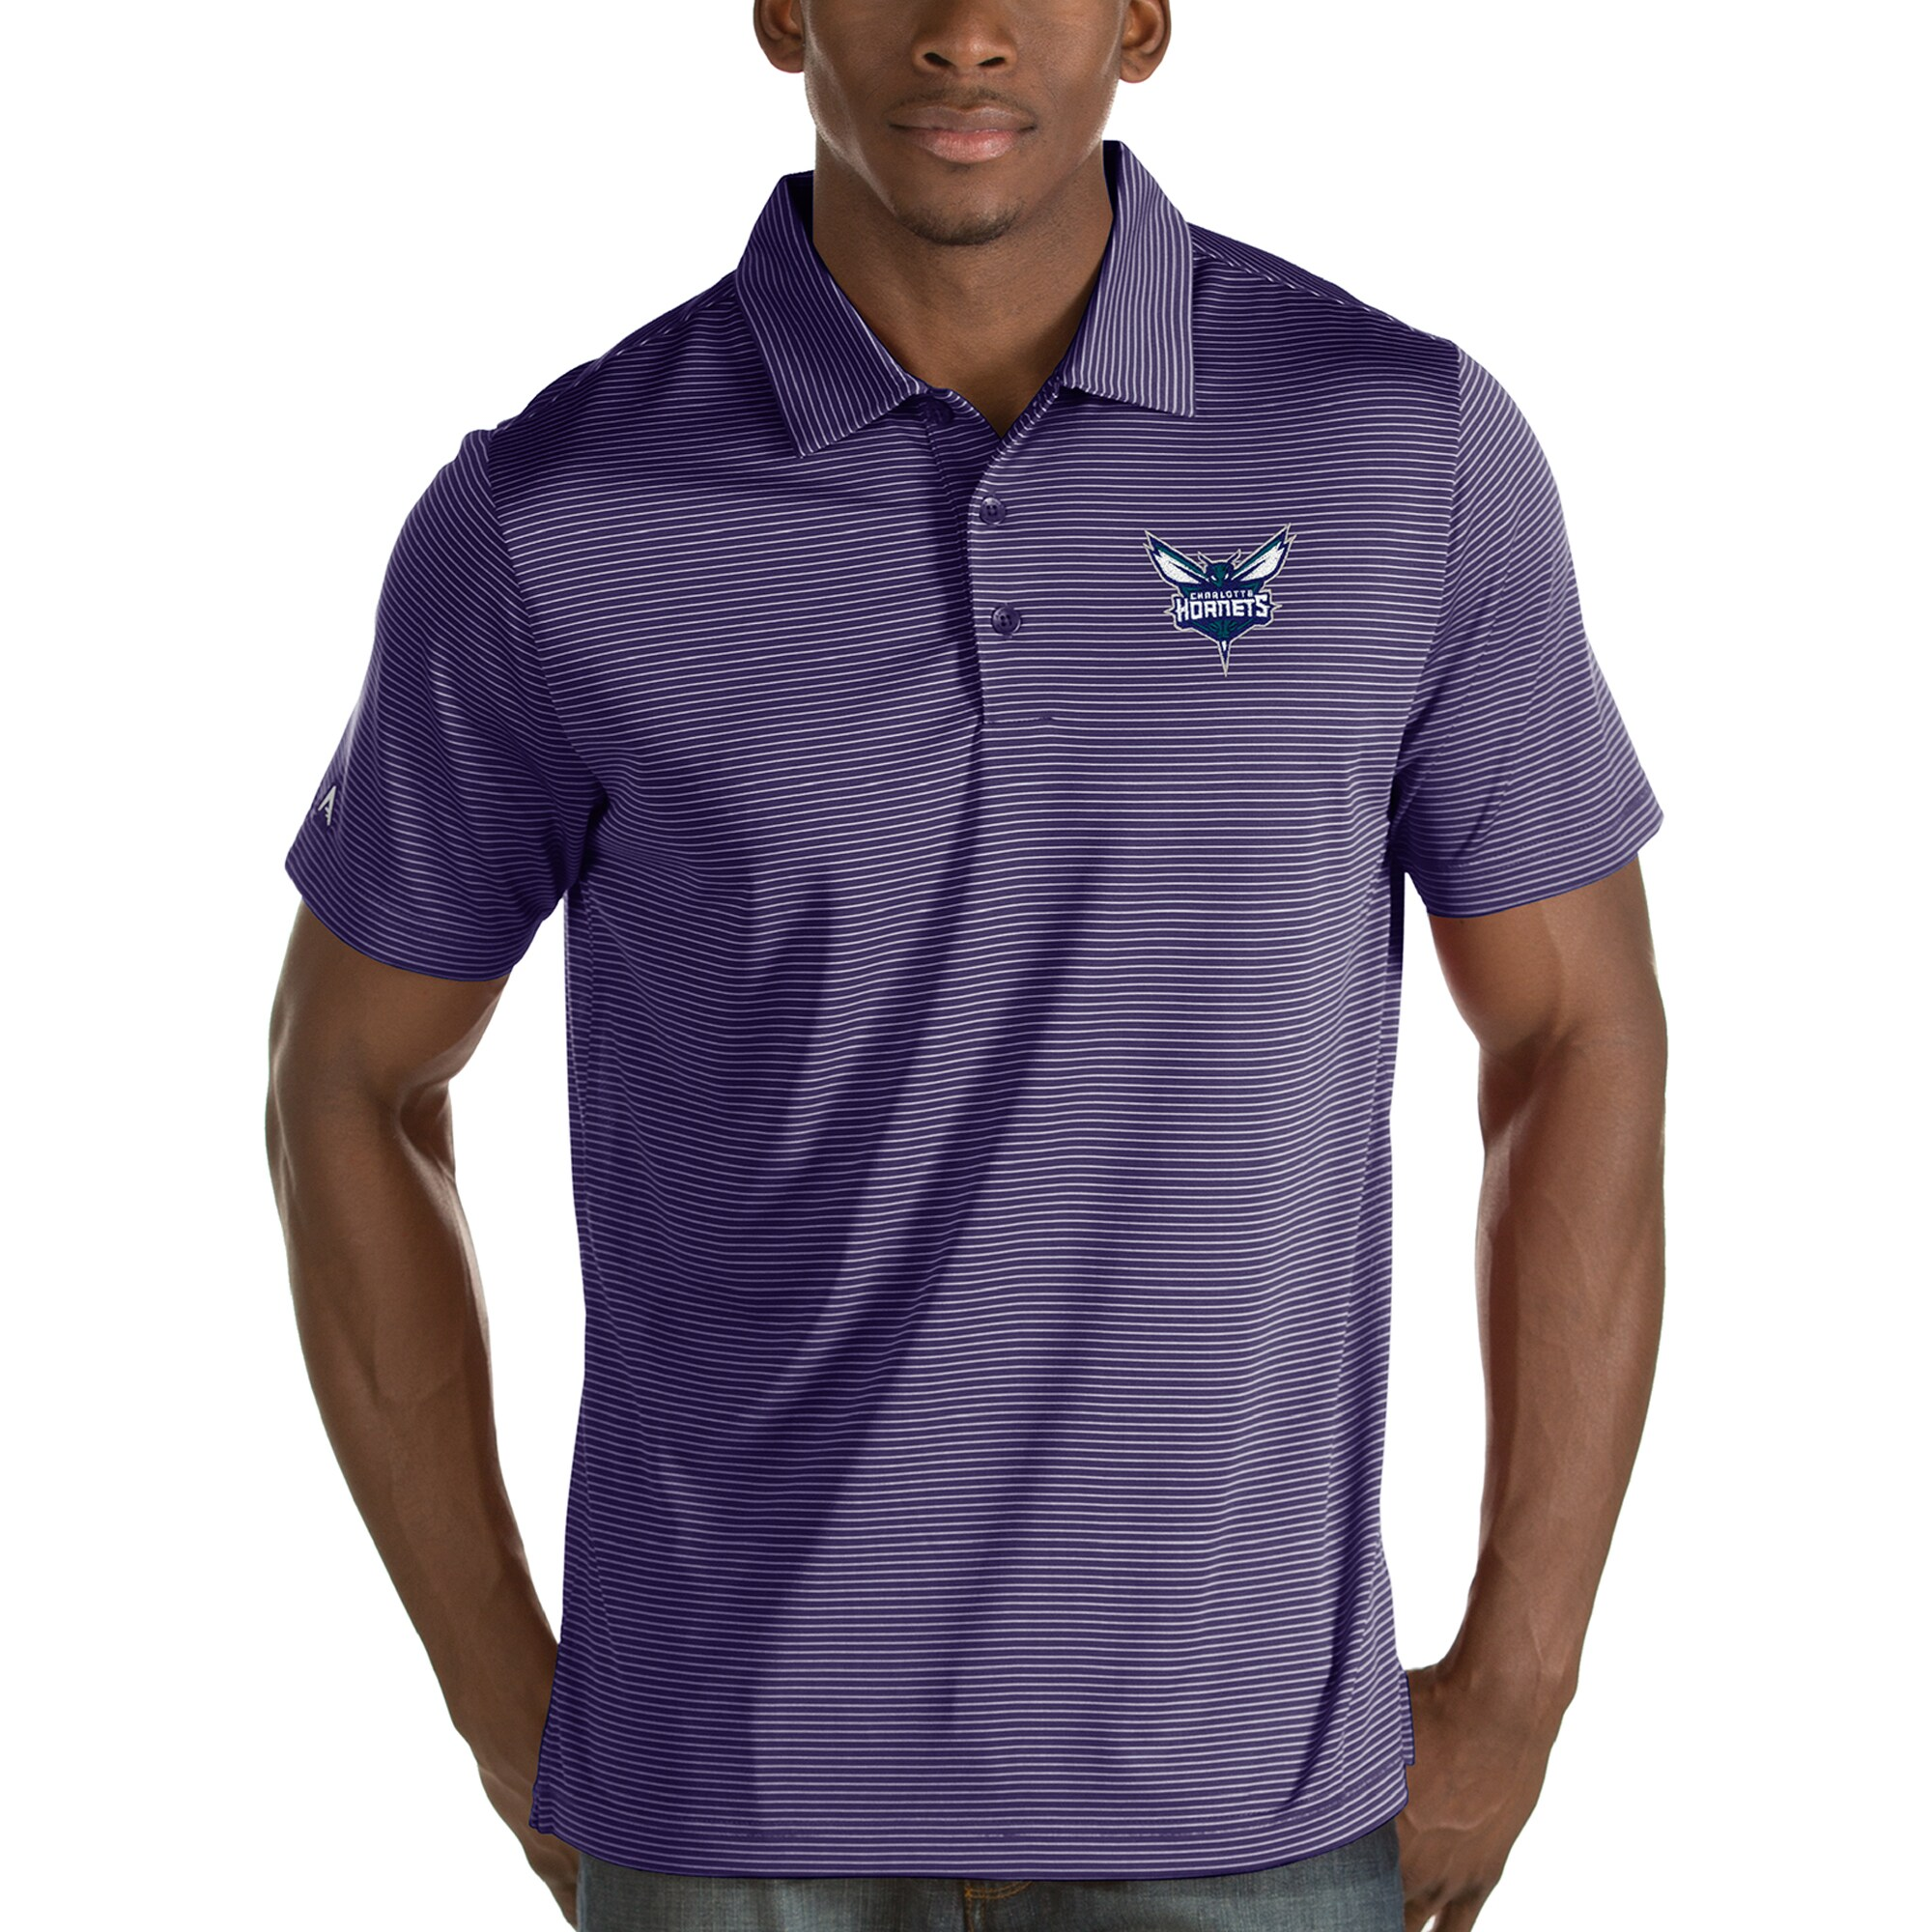 Charlotte Hornets Antigua Quest Polo - Purple